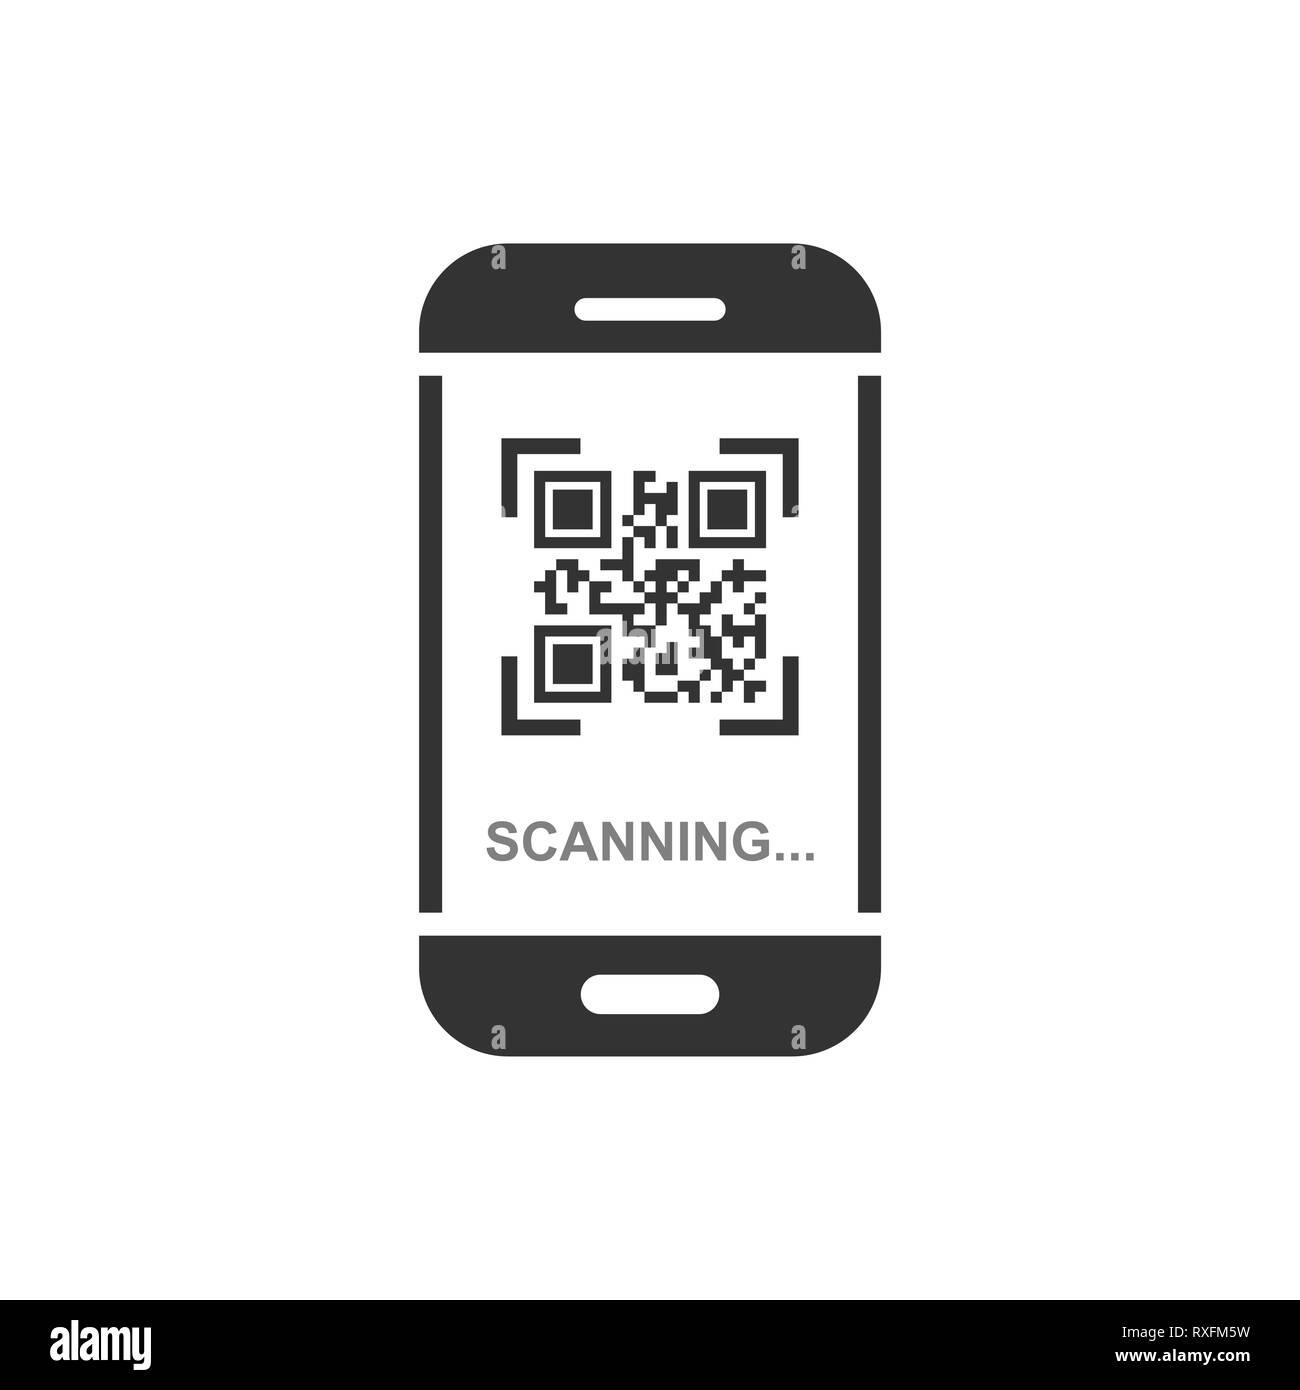 phone, qr, code, scan, smartphone, icon, scanner, vector